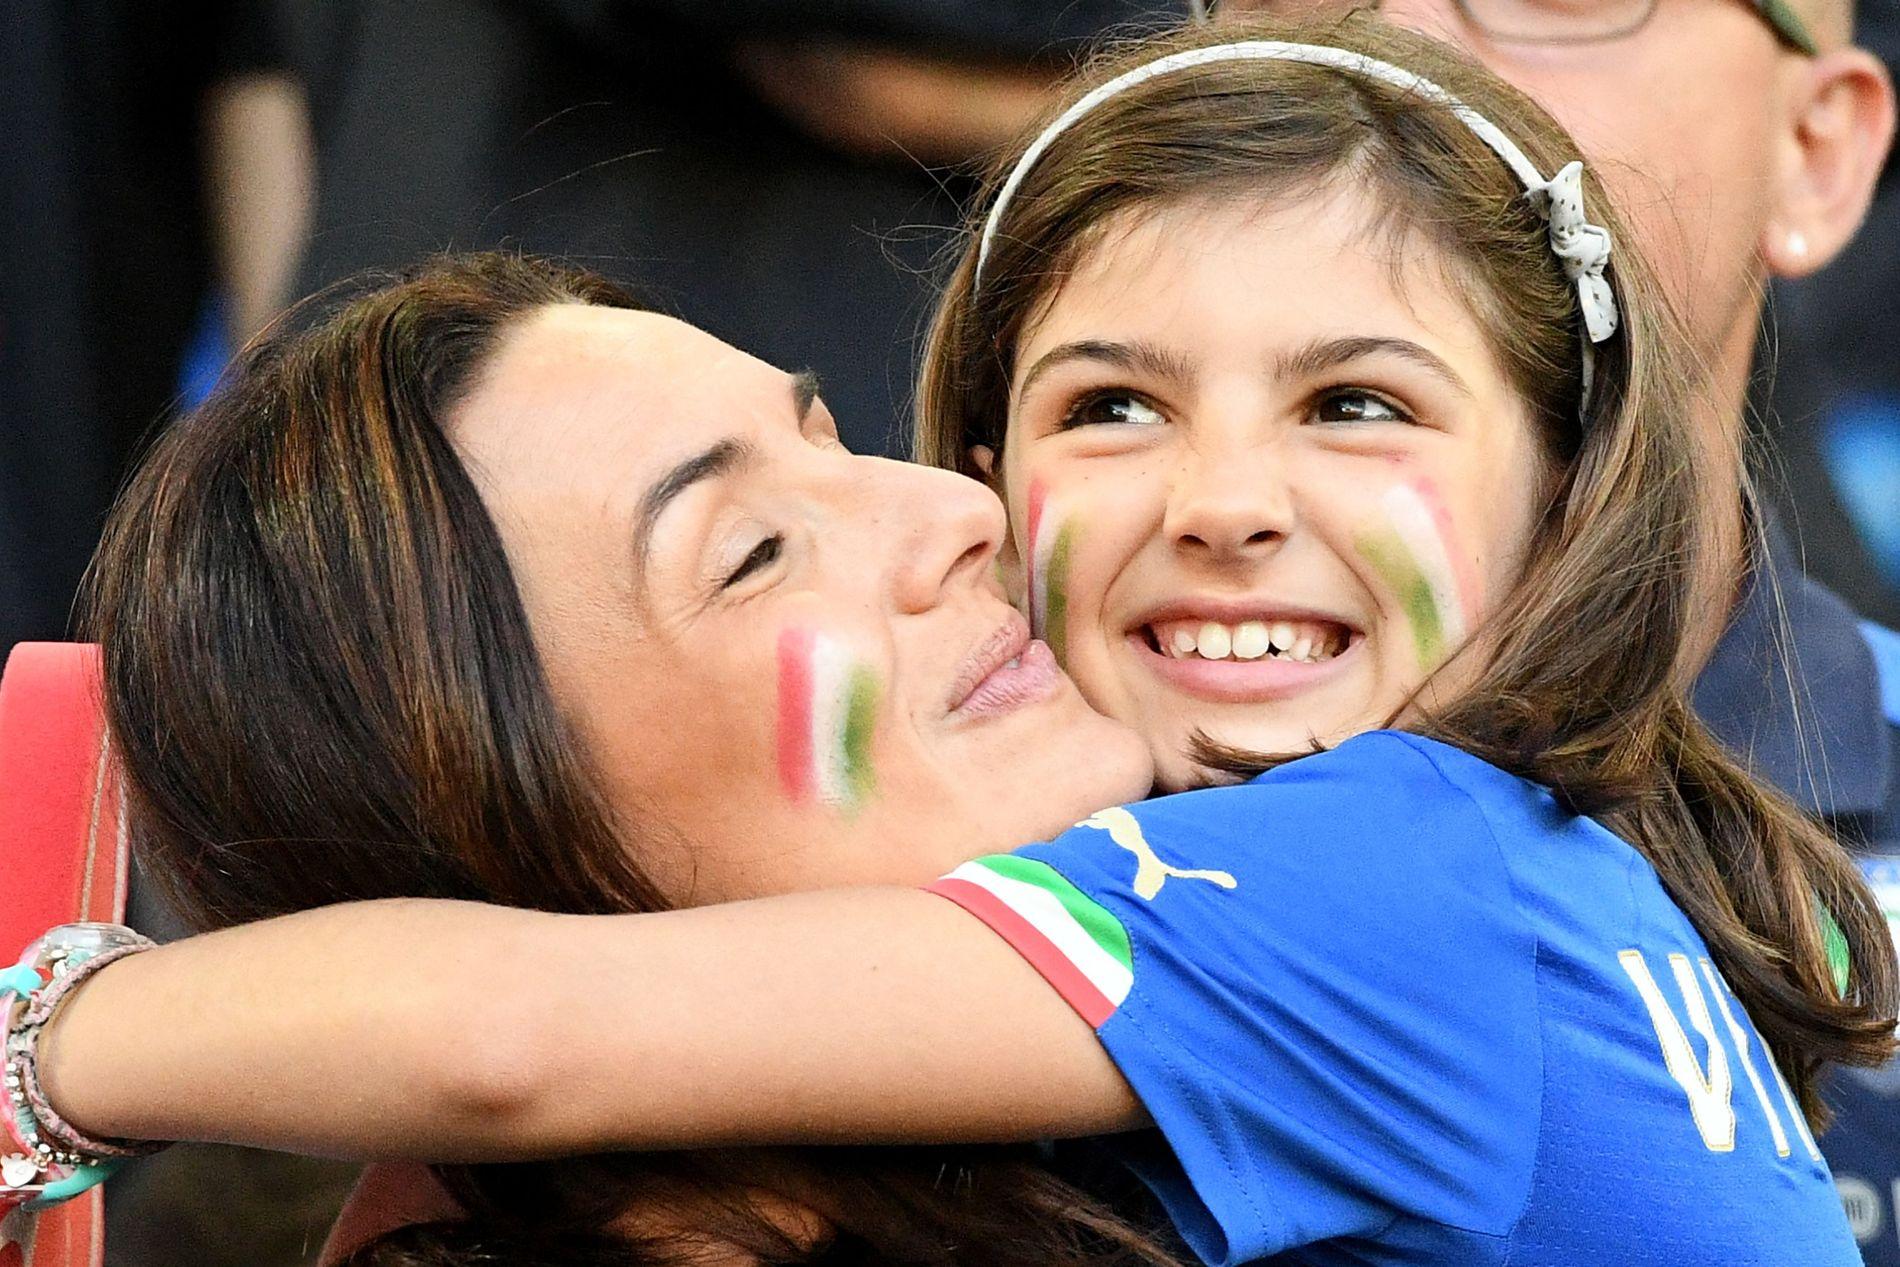 CONTES KVINNER: Antonio Contes kone, Elisabetta Muscarello, og datteren Vittoria under kvartfinalen mellom Italia og Tyskland i Bordeaux i fjor sommer. Contes Italia tapte etter straffespark-konkurranse. Foto: AFP